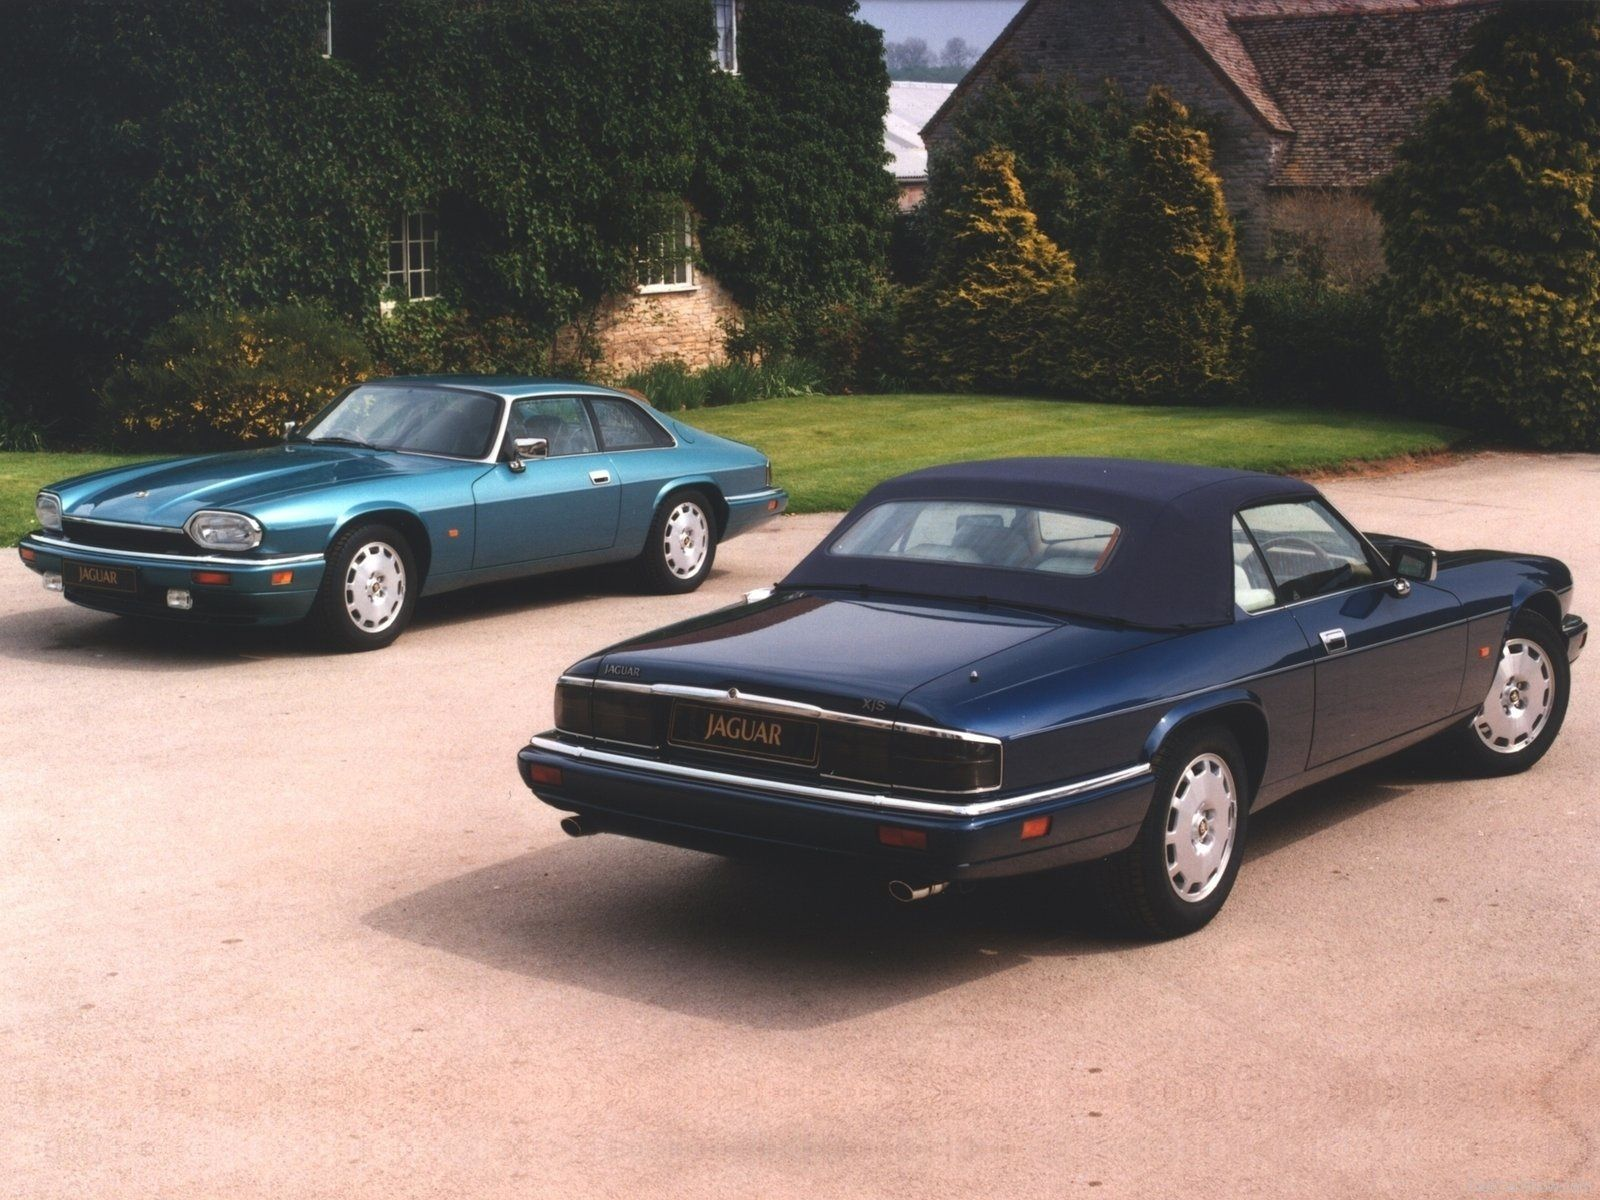 Used Jaguar Xjs Sport Cars For Sale Today Http Www Cars For Sales Com P 13717 Jaguarxjs Jaguar Car Jaguar Jaguar Daimler